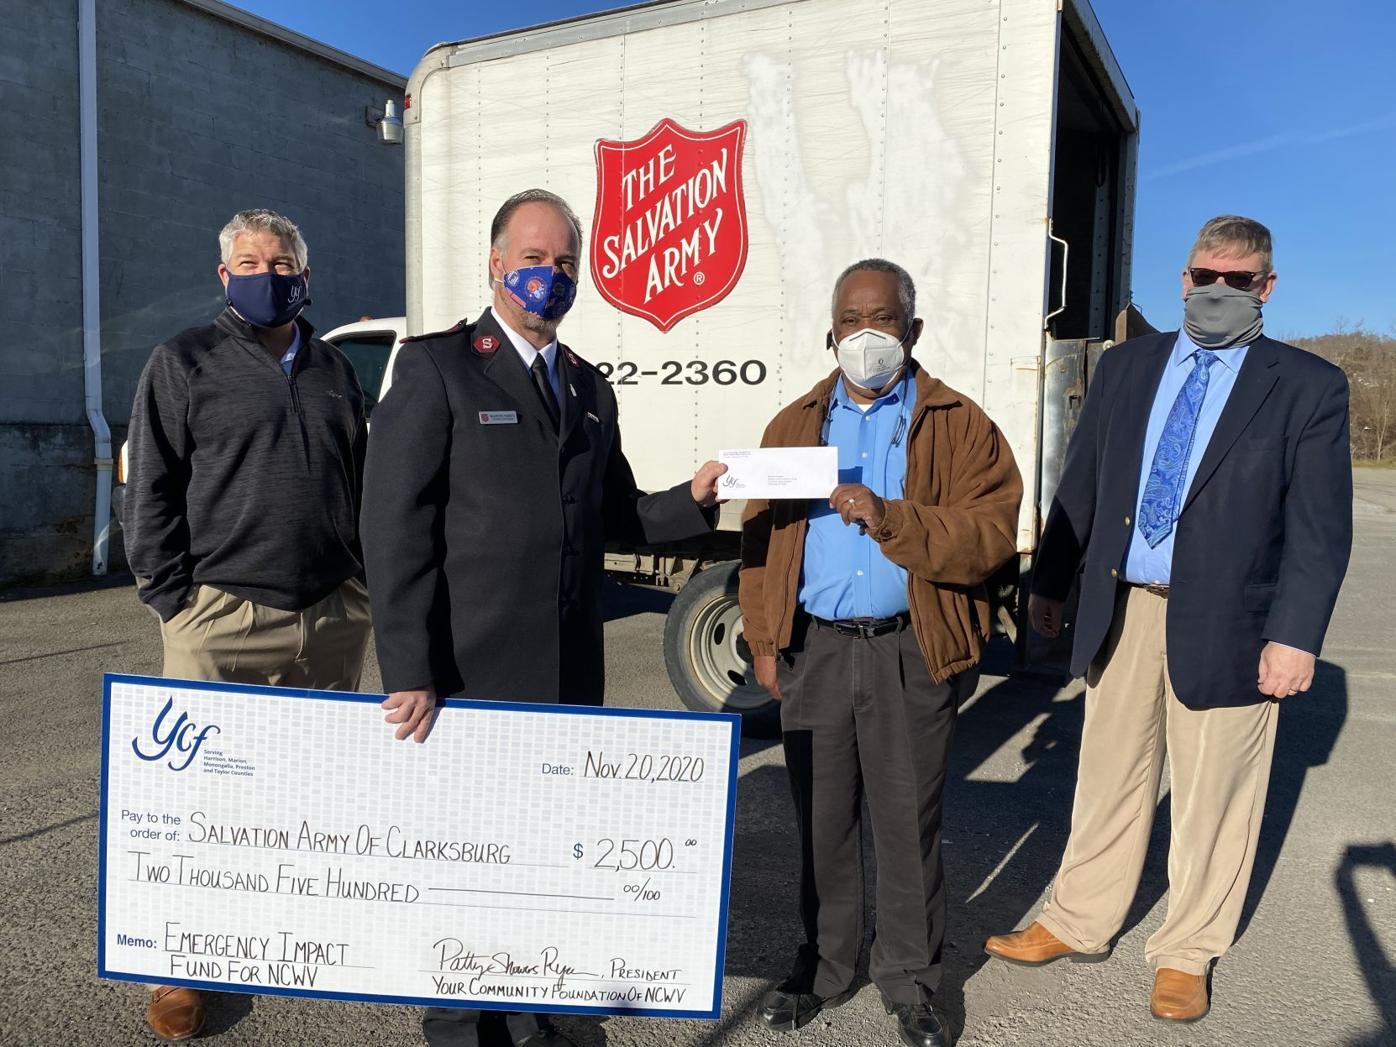 YCF Salvation Army of Clarksburg donation